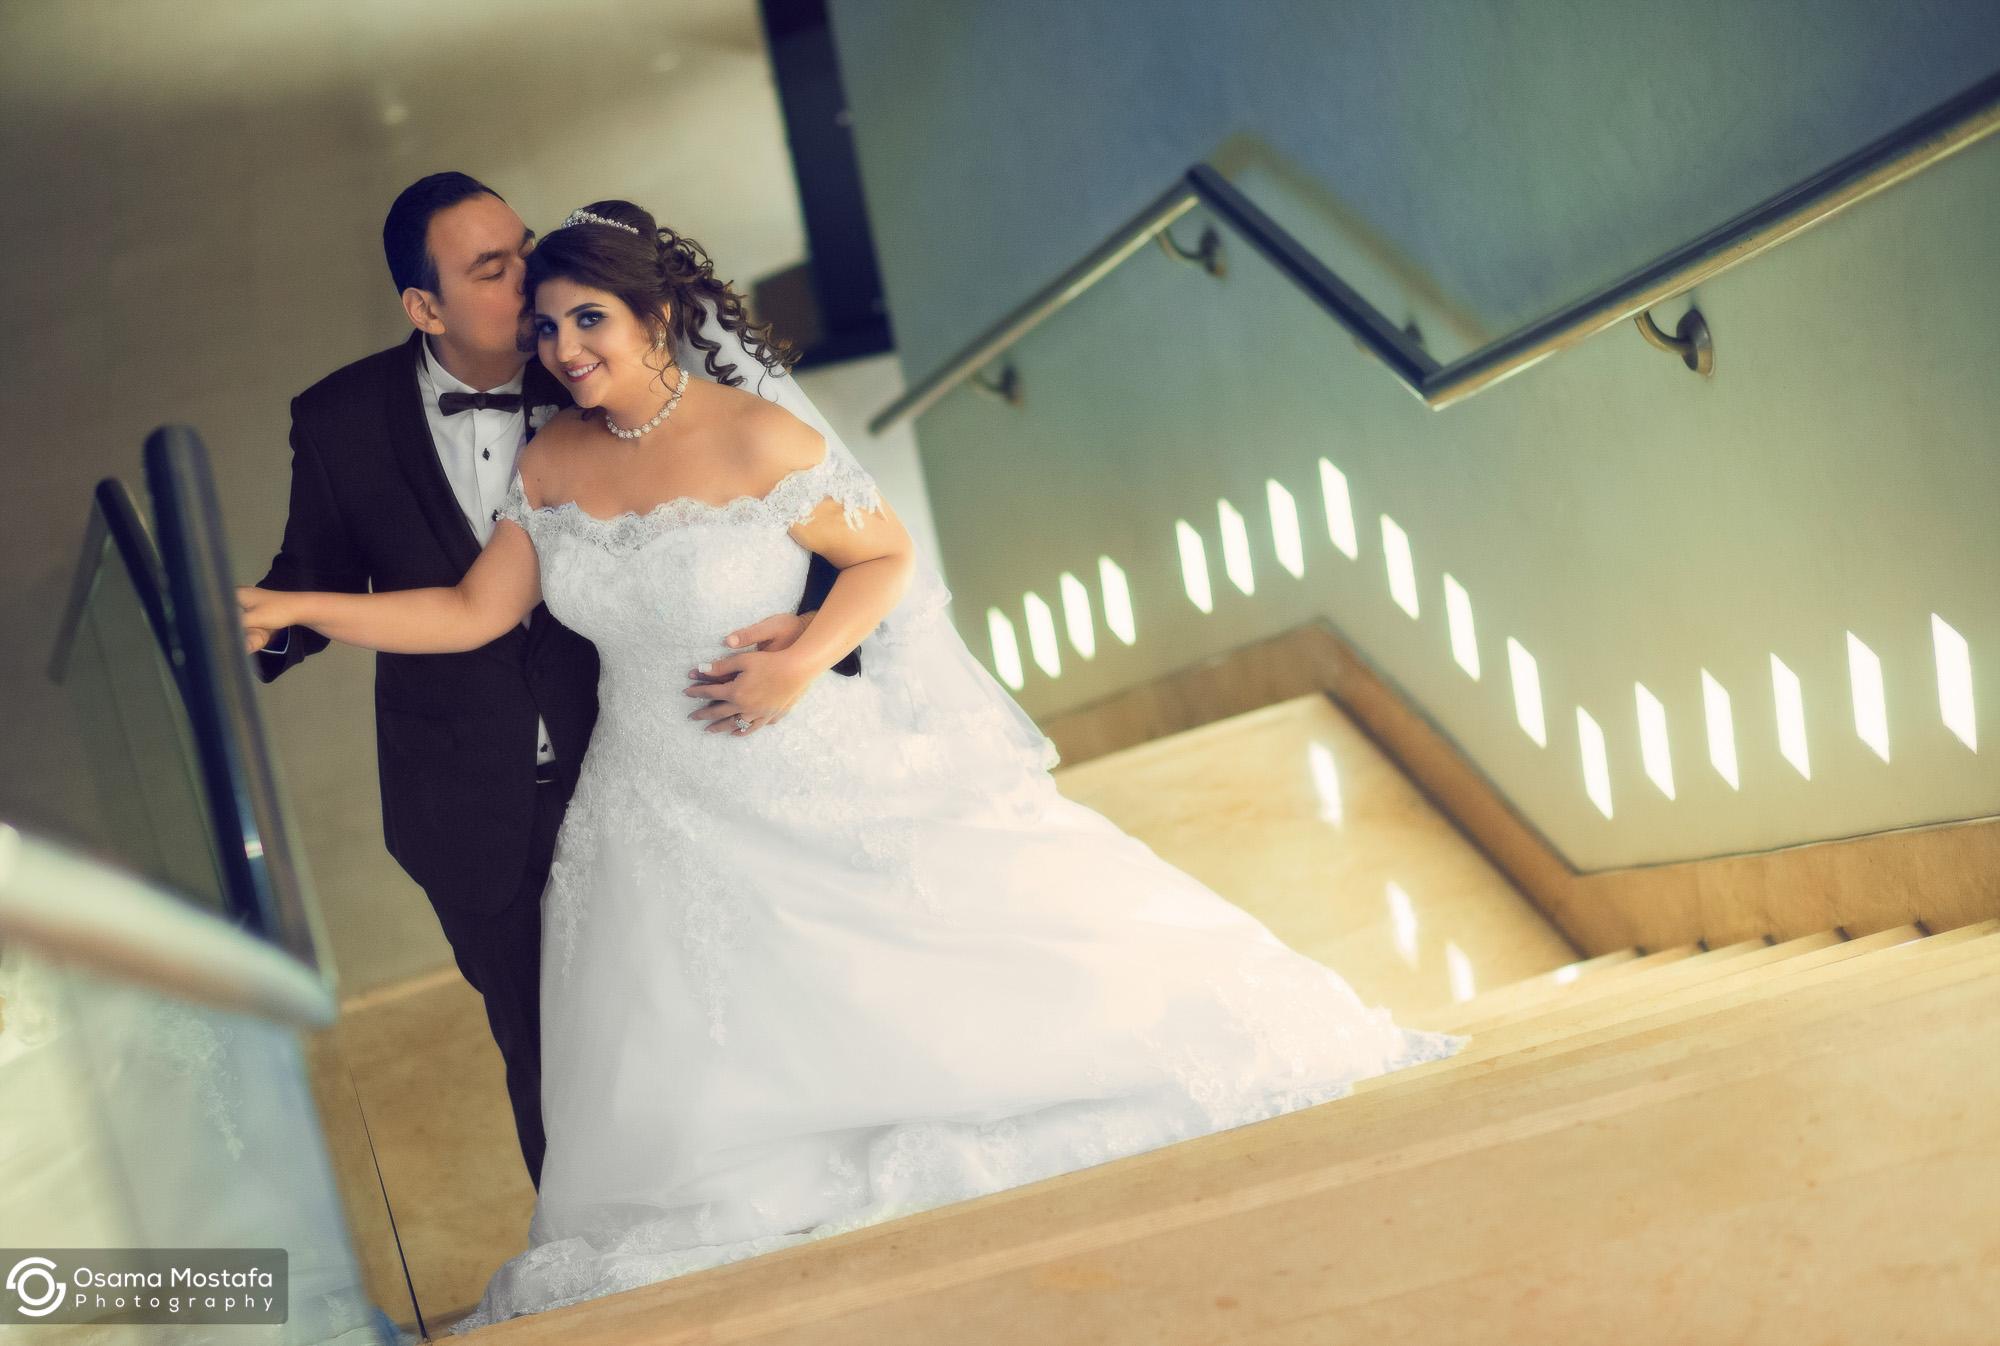 Nariman & Emad